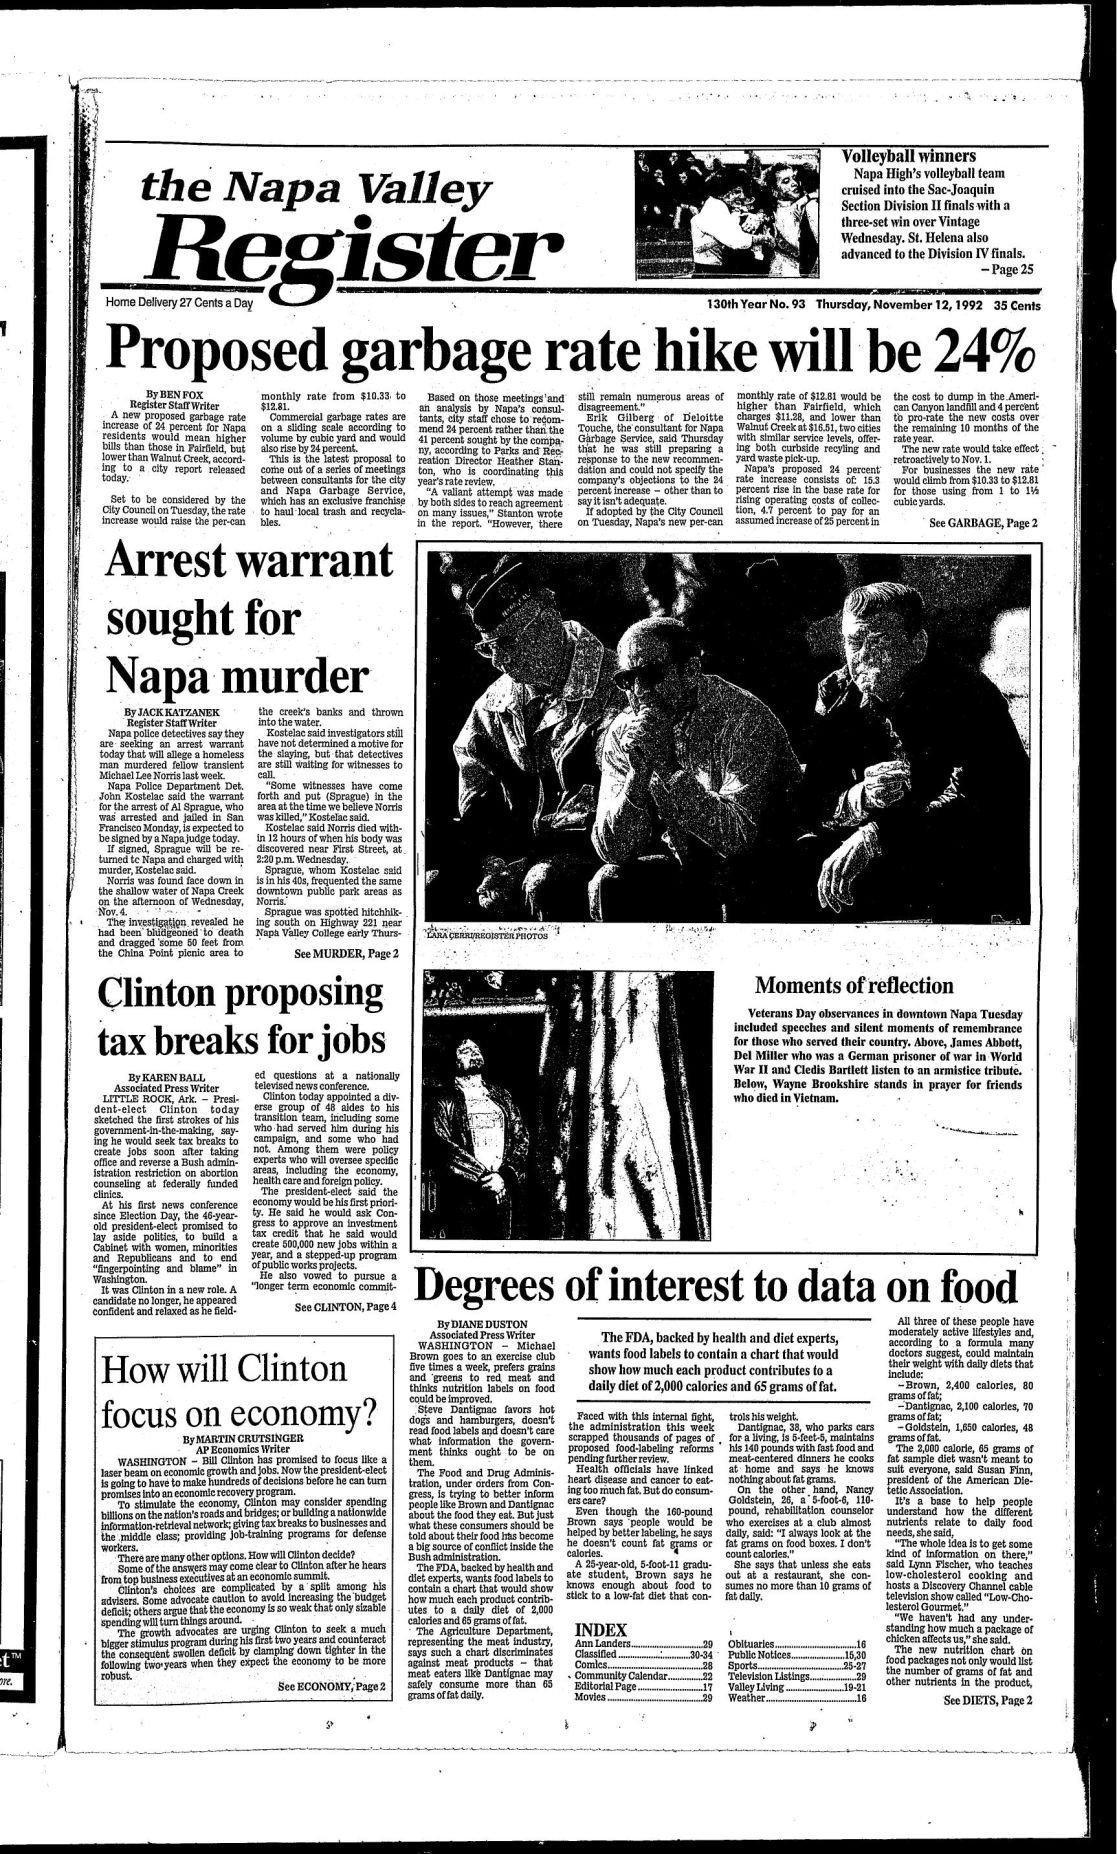 Nov. 12, 1992